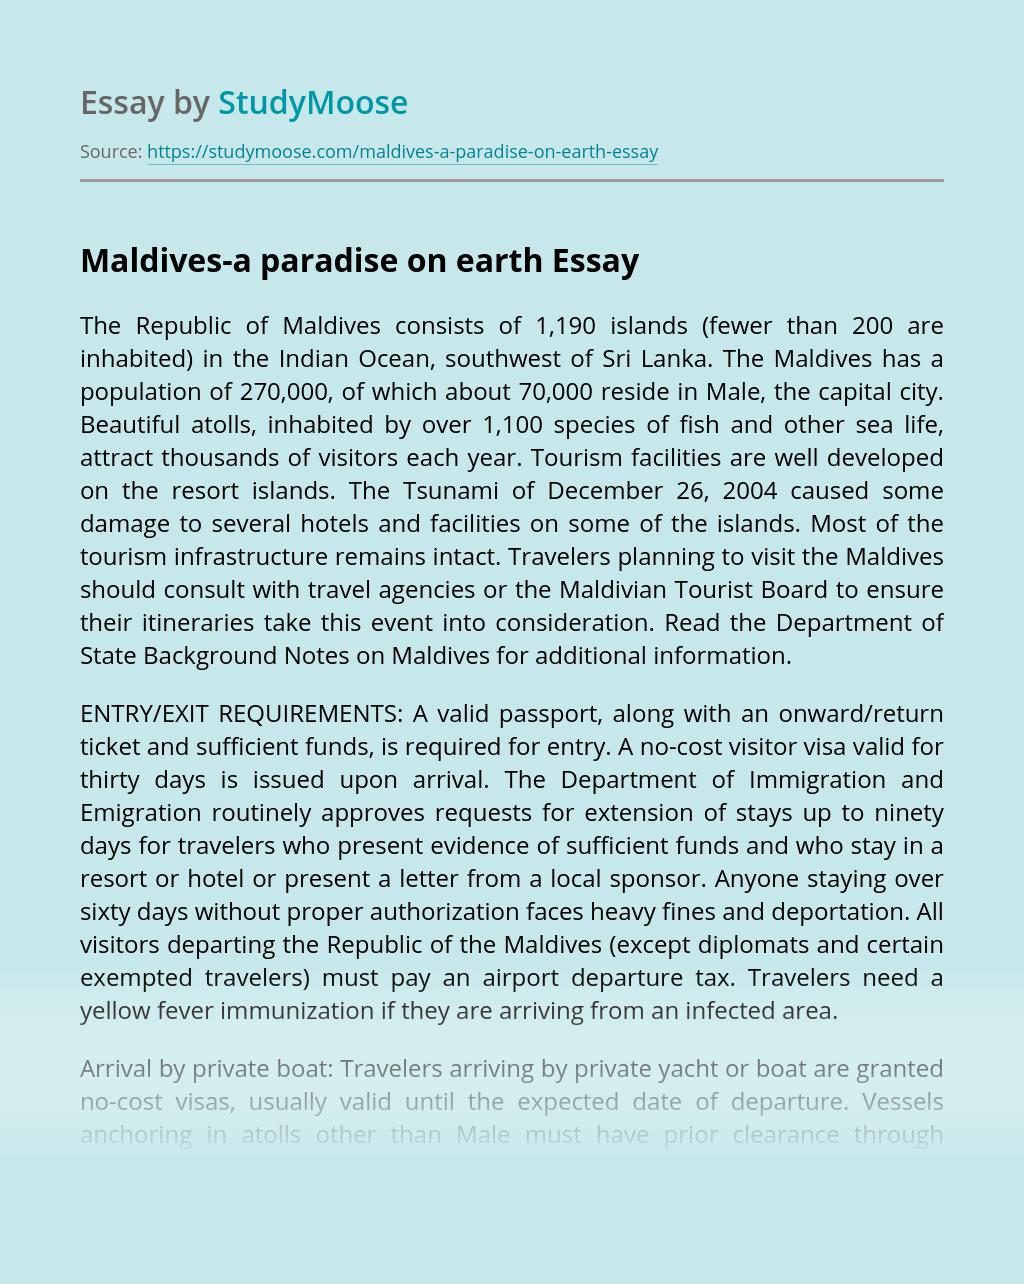 Maldives-a paradise on earth